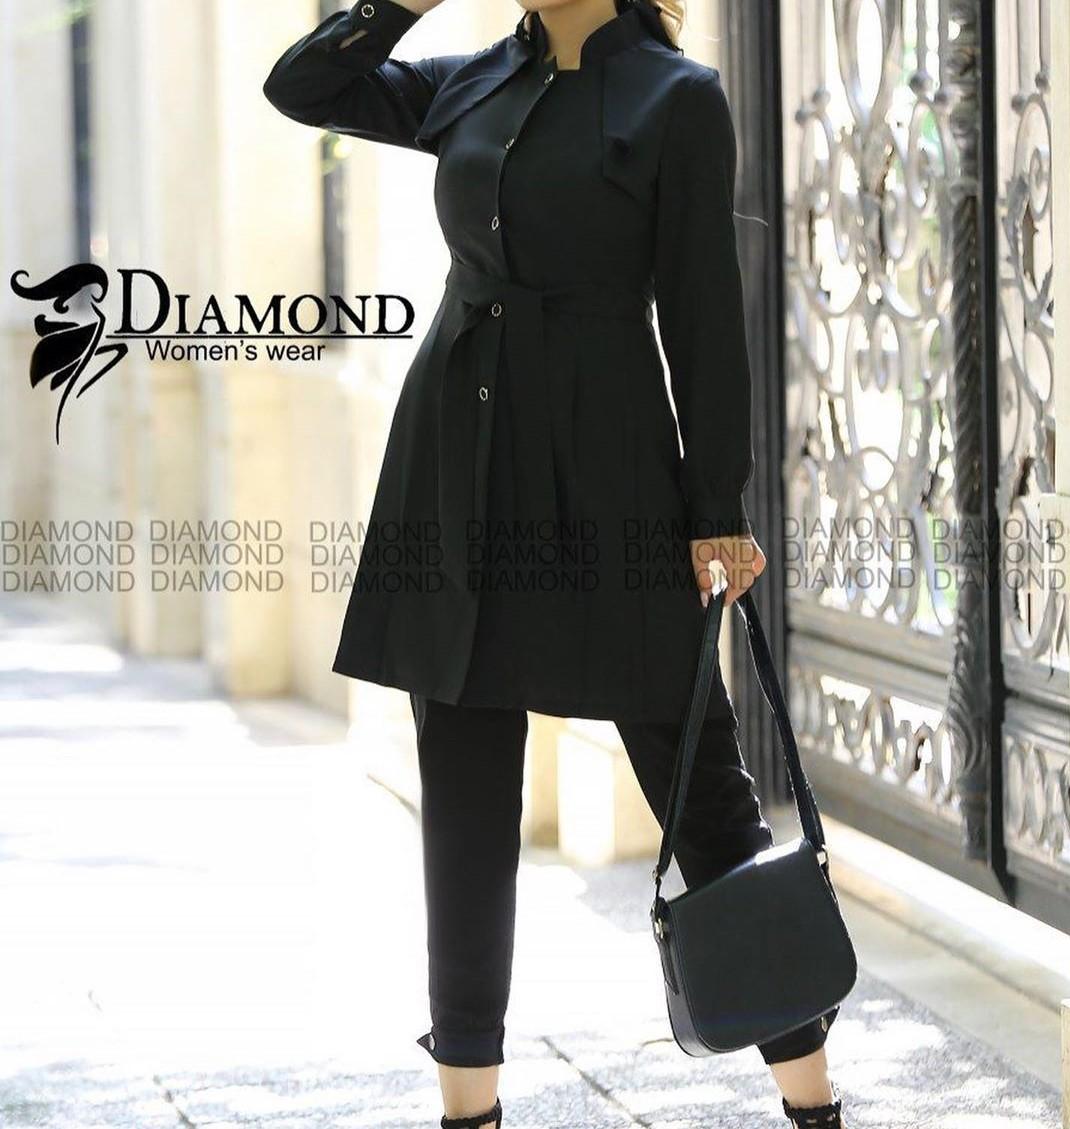 مدل مانتو اسپرت پاییزی زنانه